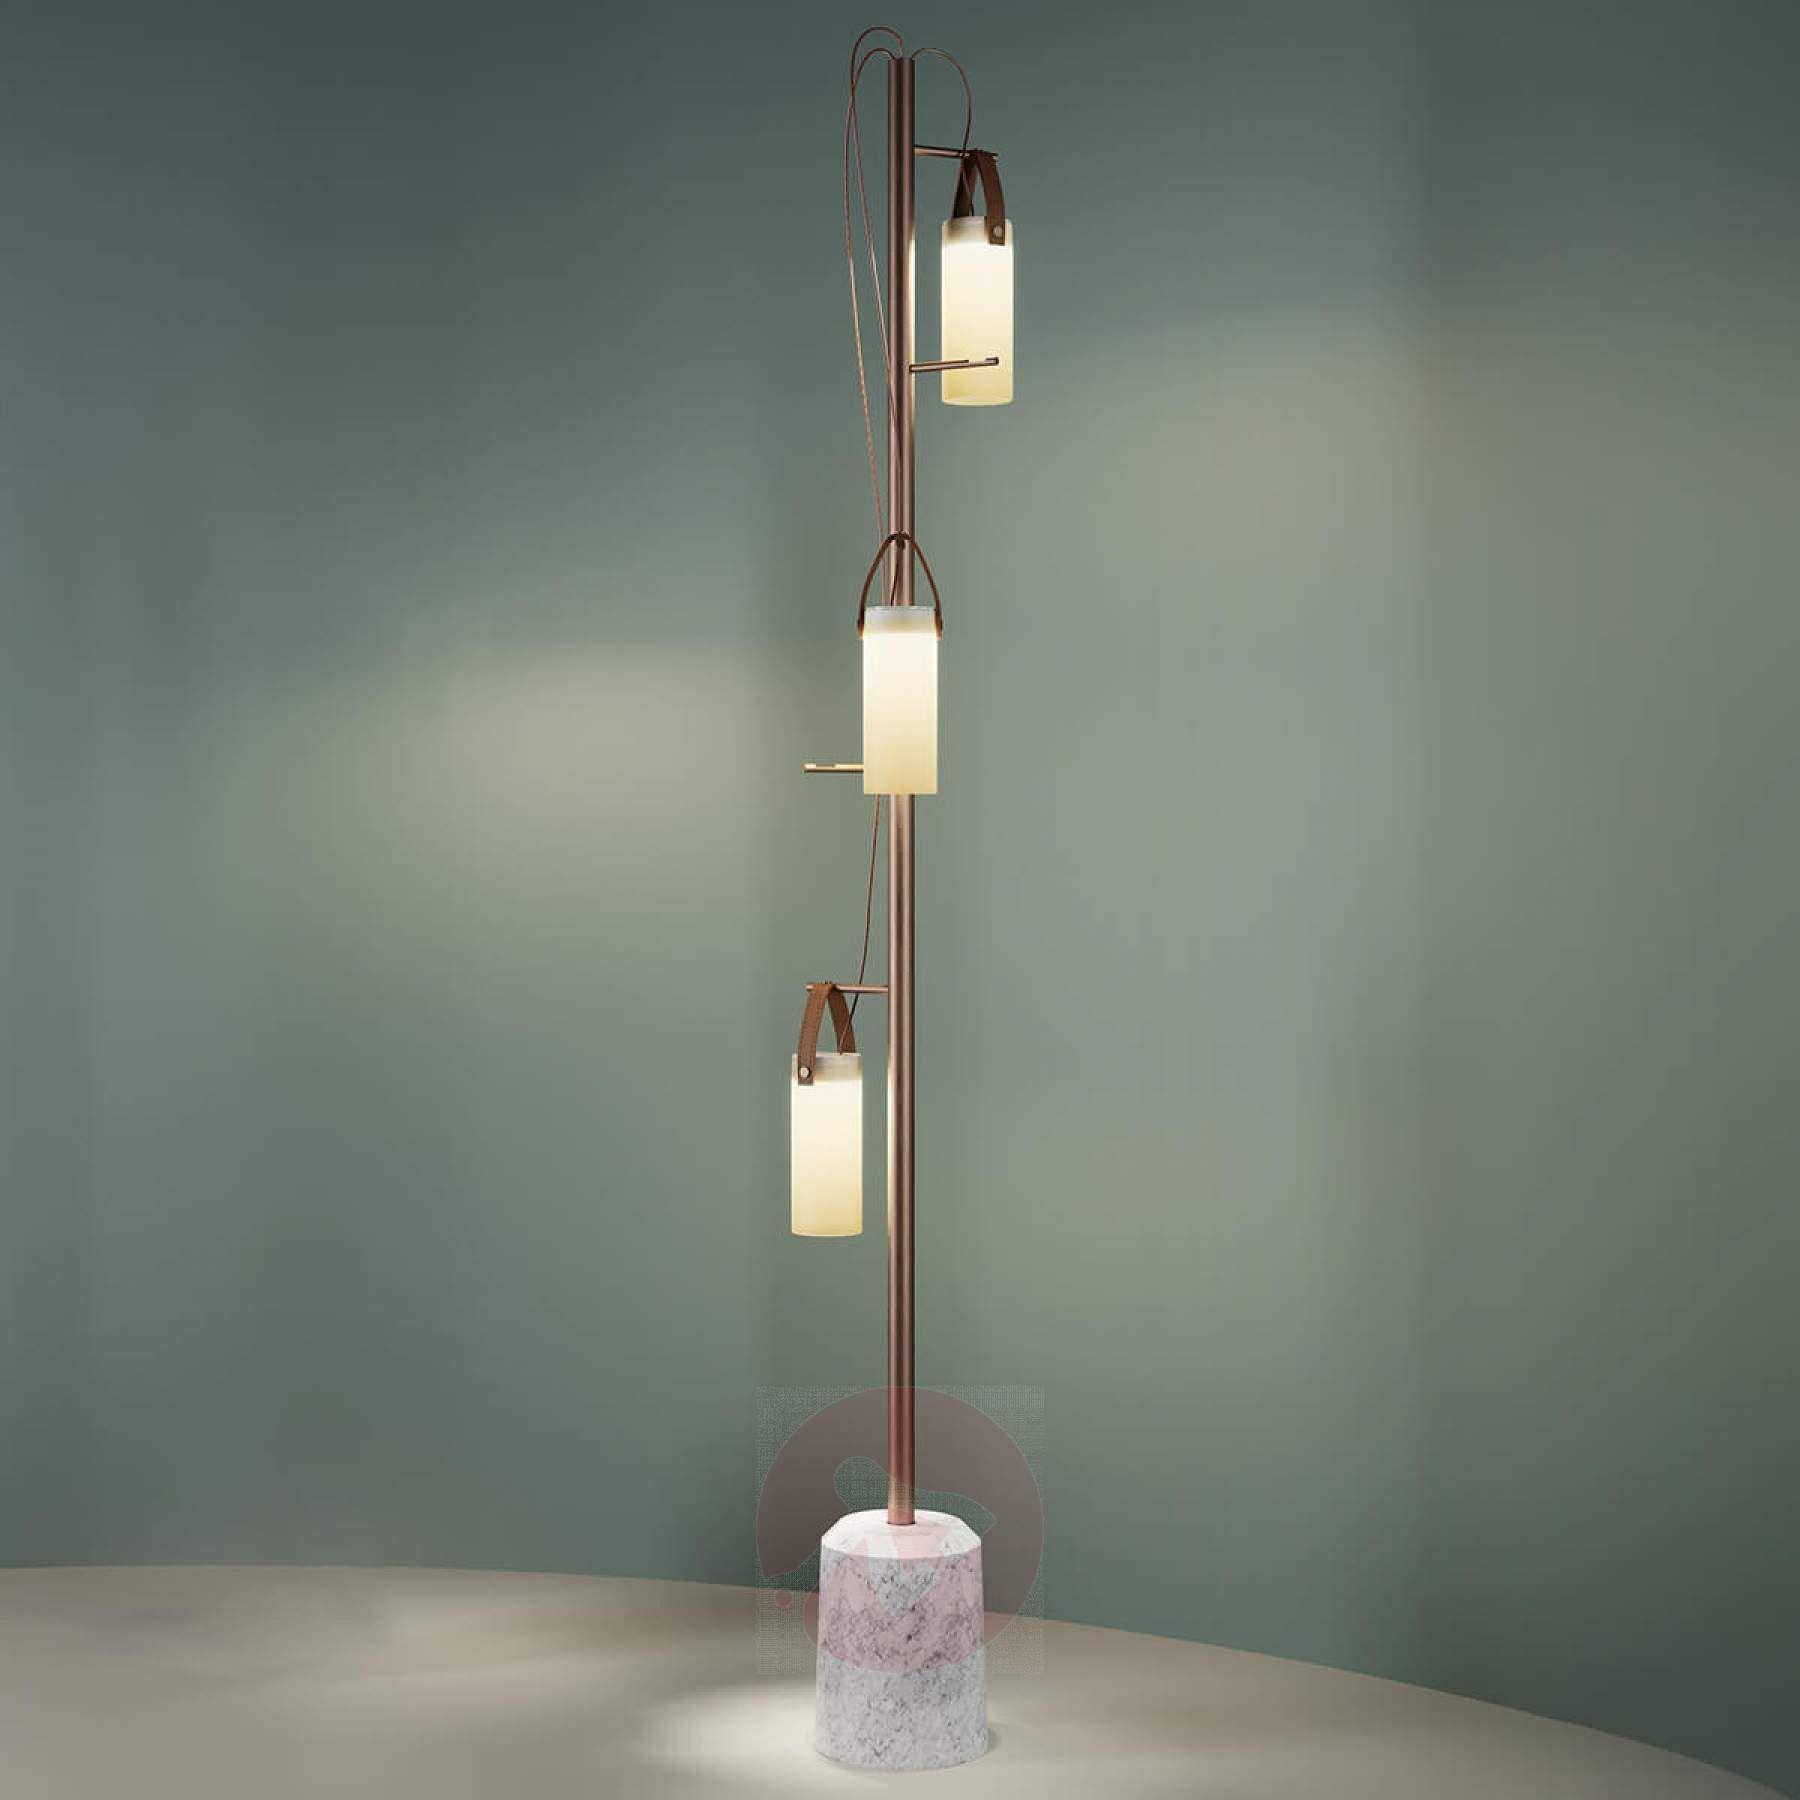 3 Punktowa Designerska Lampa Stojąca Led Galerie Marmur